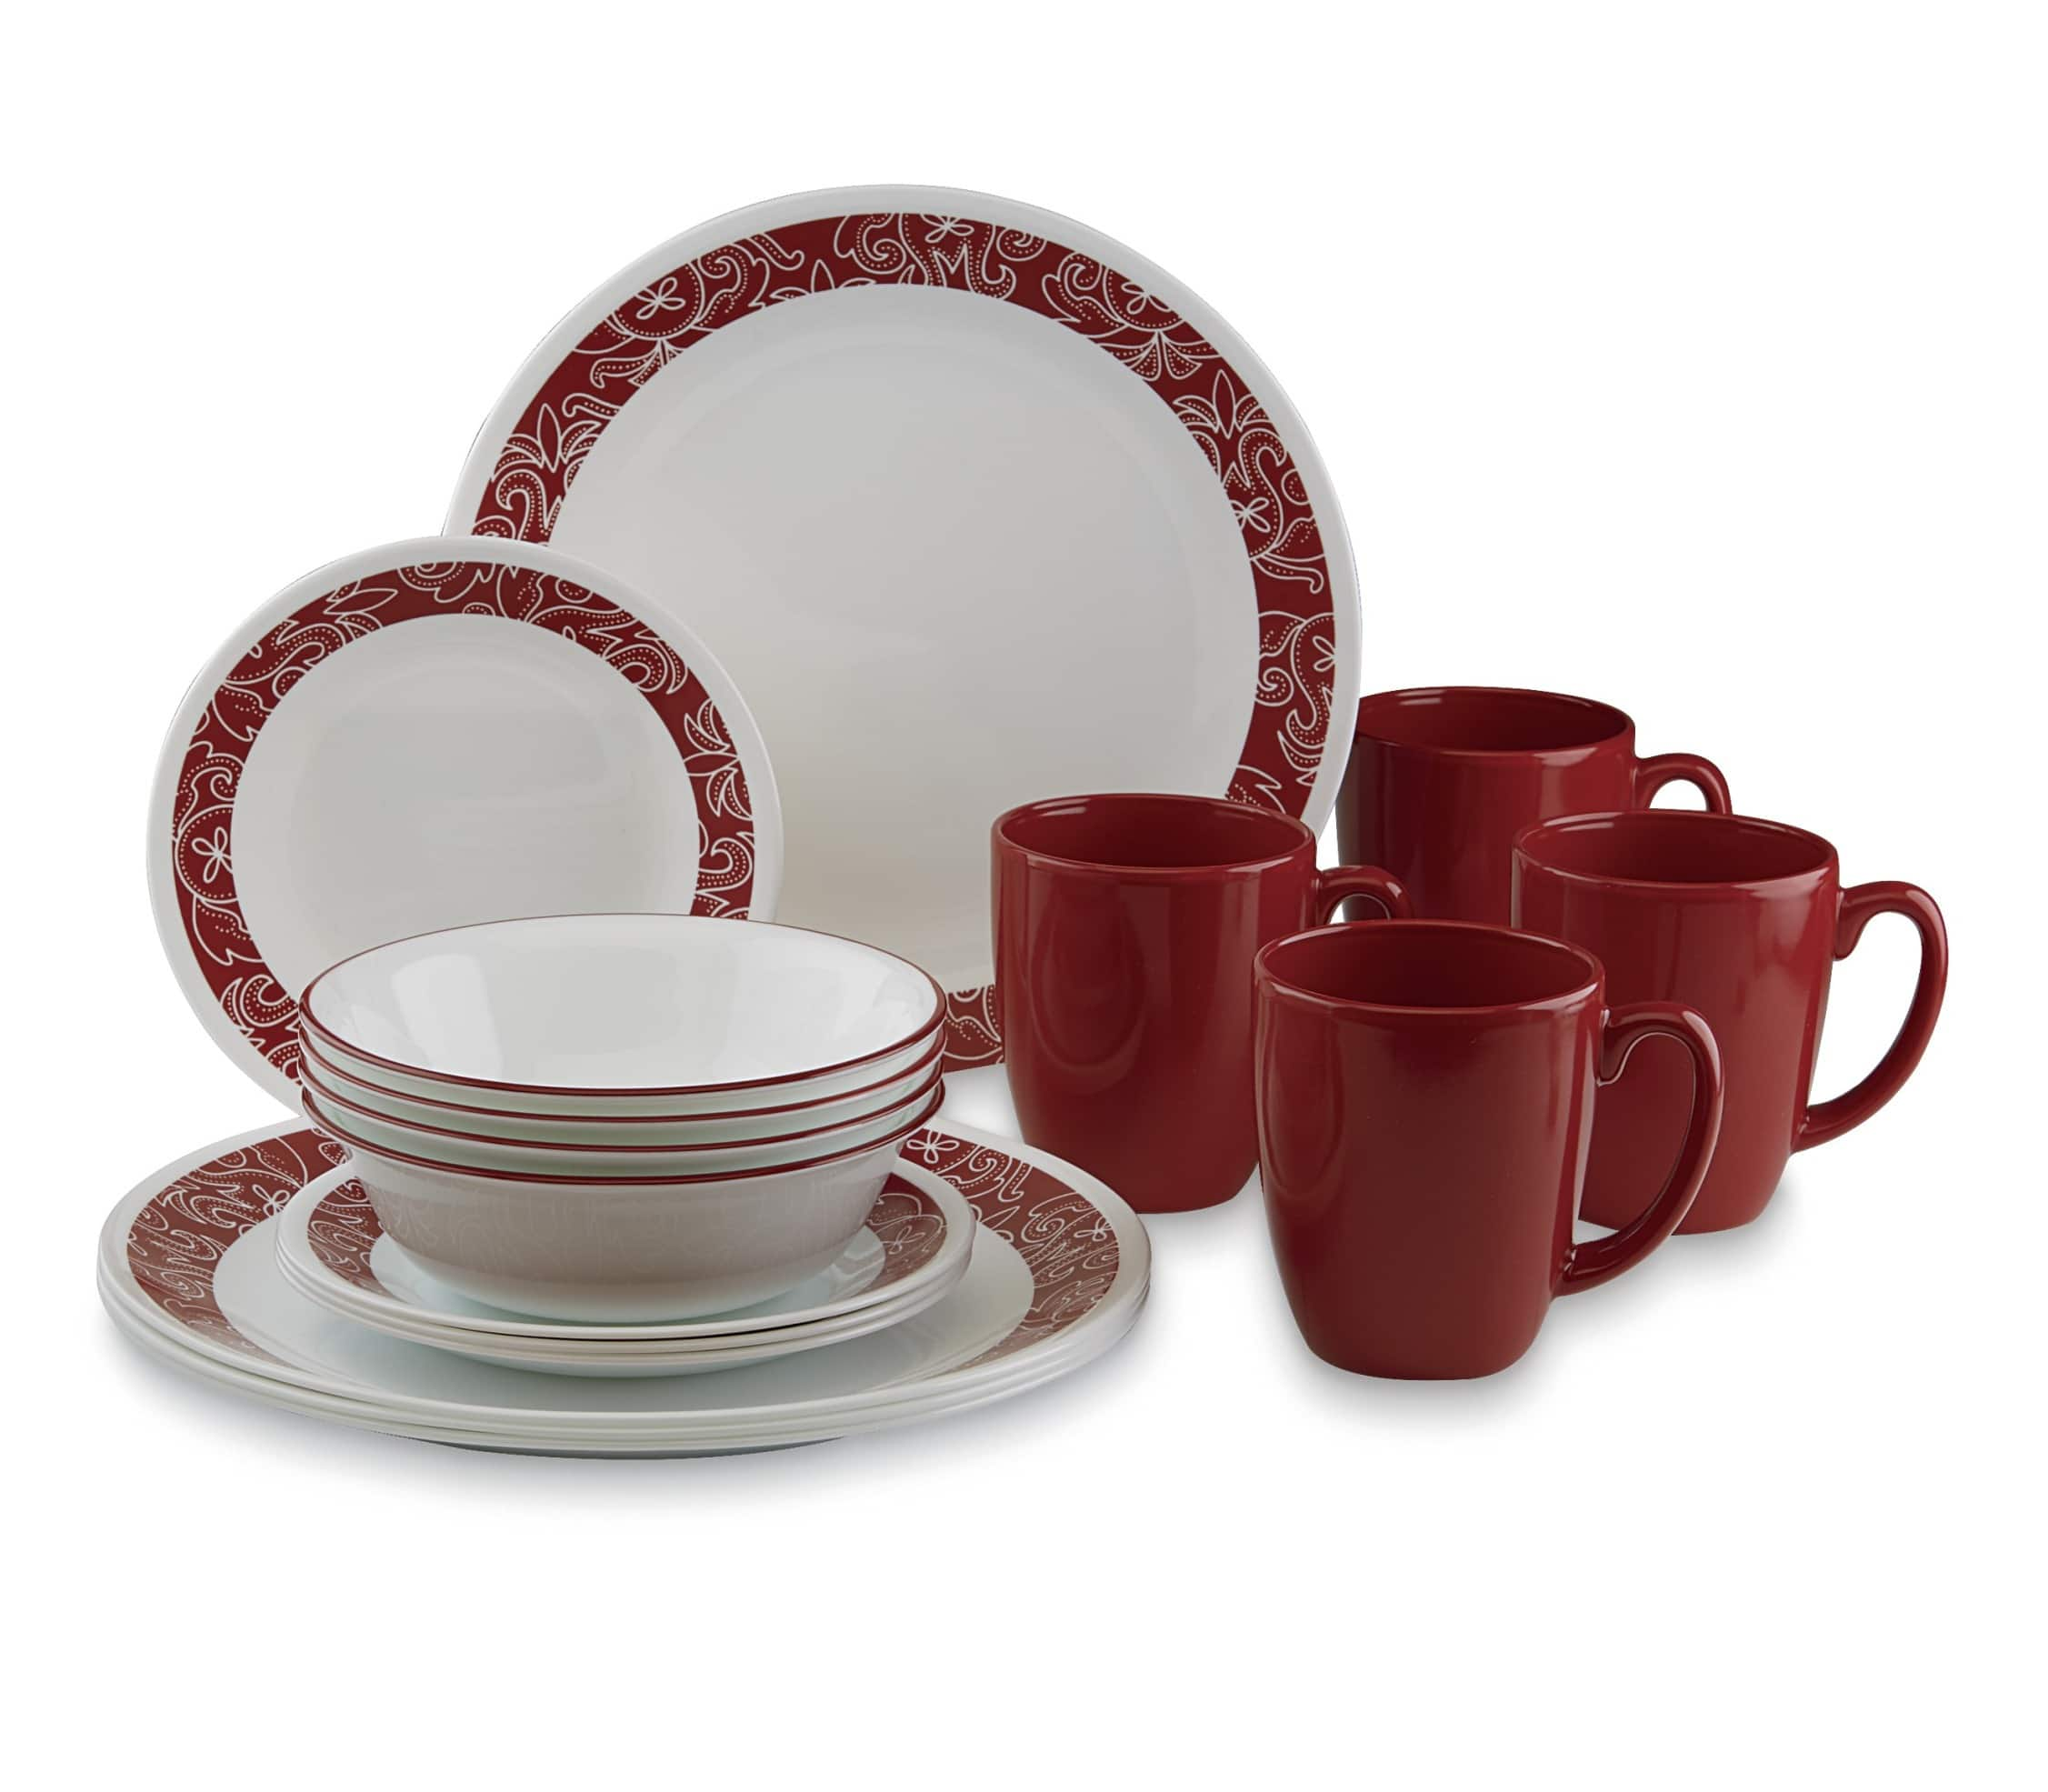 Corelle Livingware 16pc dinnerware set - Bandhani design $10